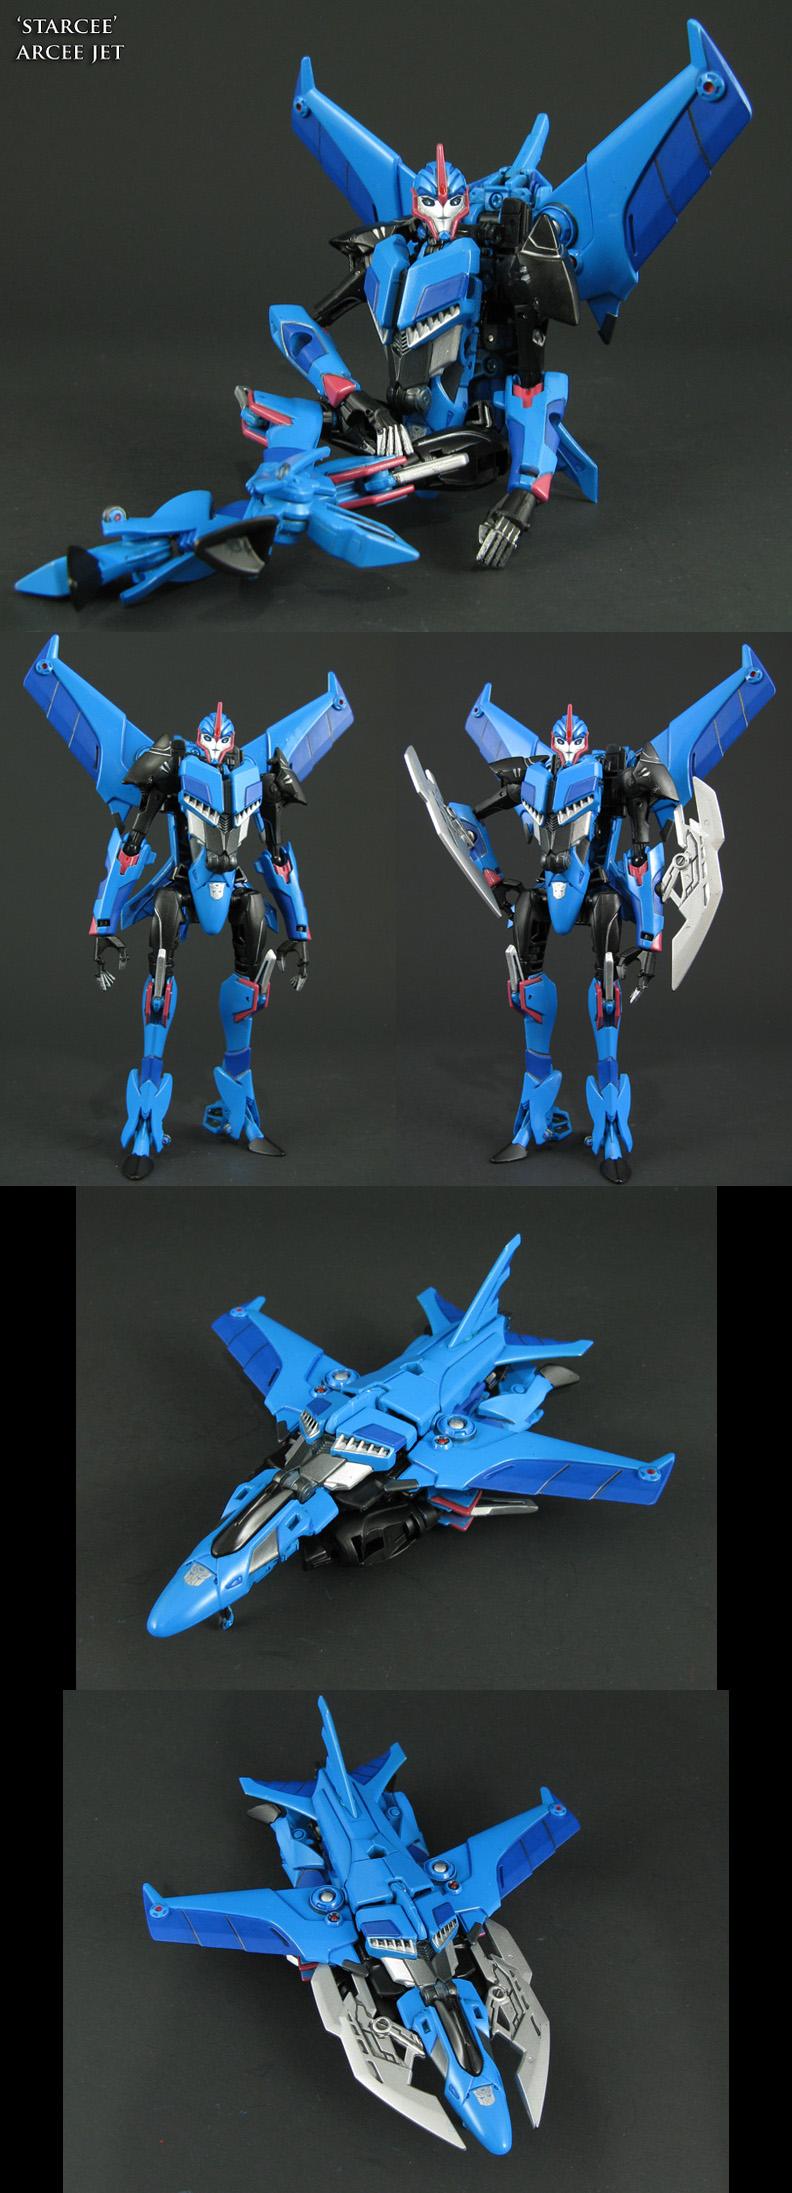 Transformers Starcee custom Arcee jet mode by Jin-Saotome